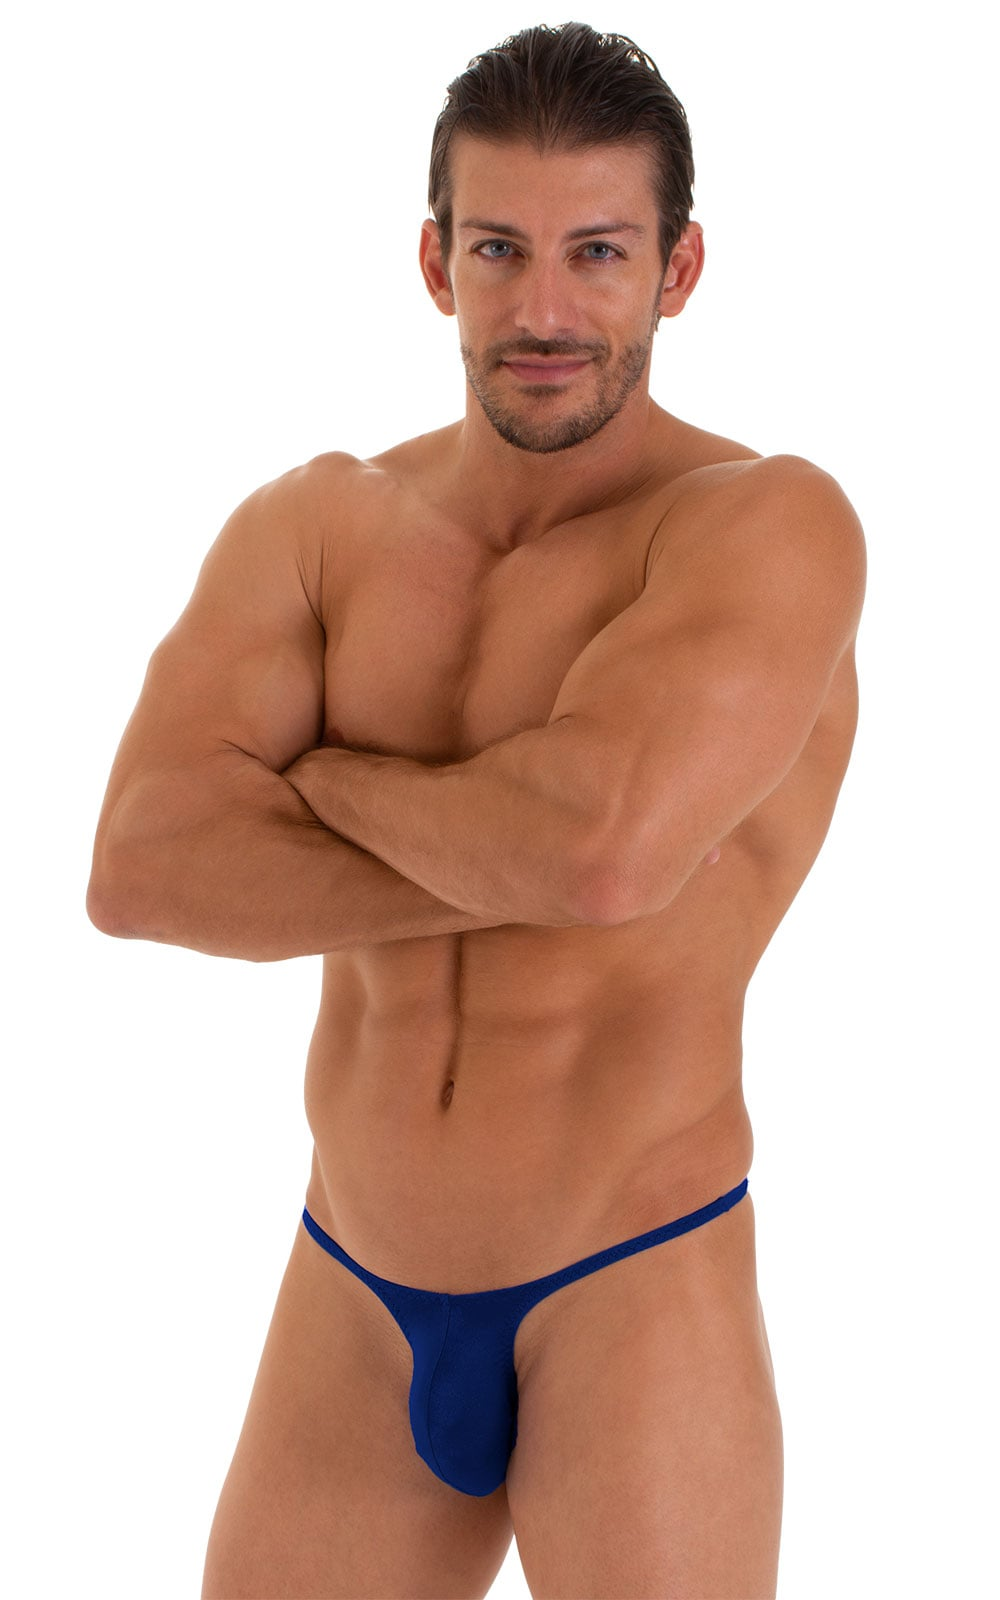 Sunseeker Micro Pouch Half Back Bikini in ThinSkinz Royal Blue 1